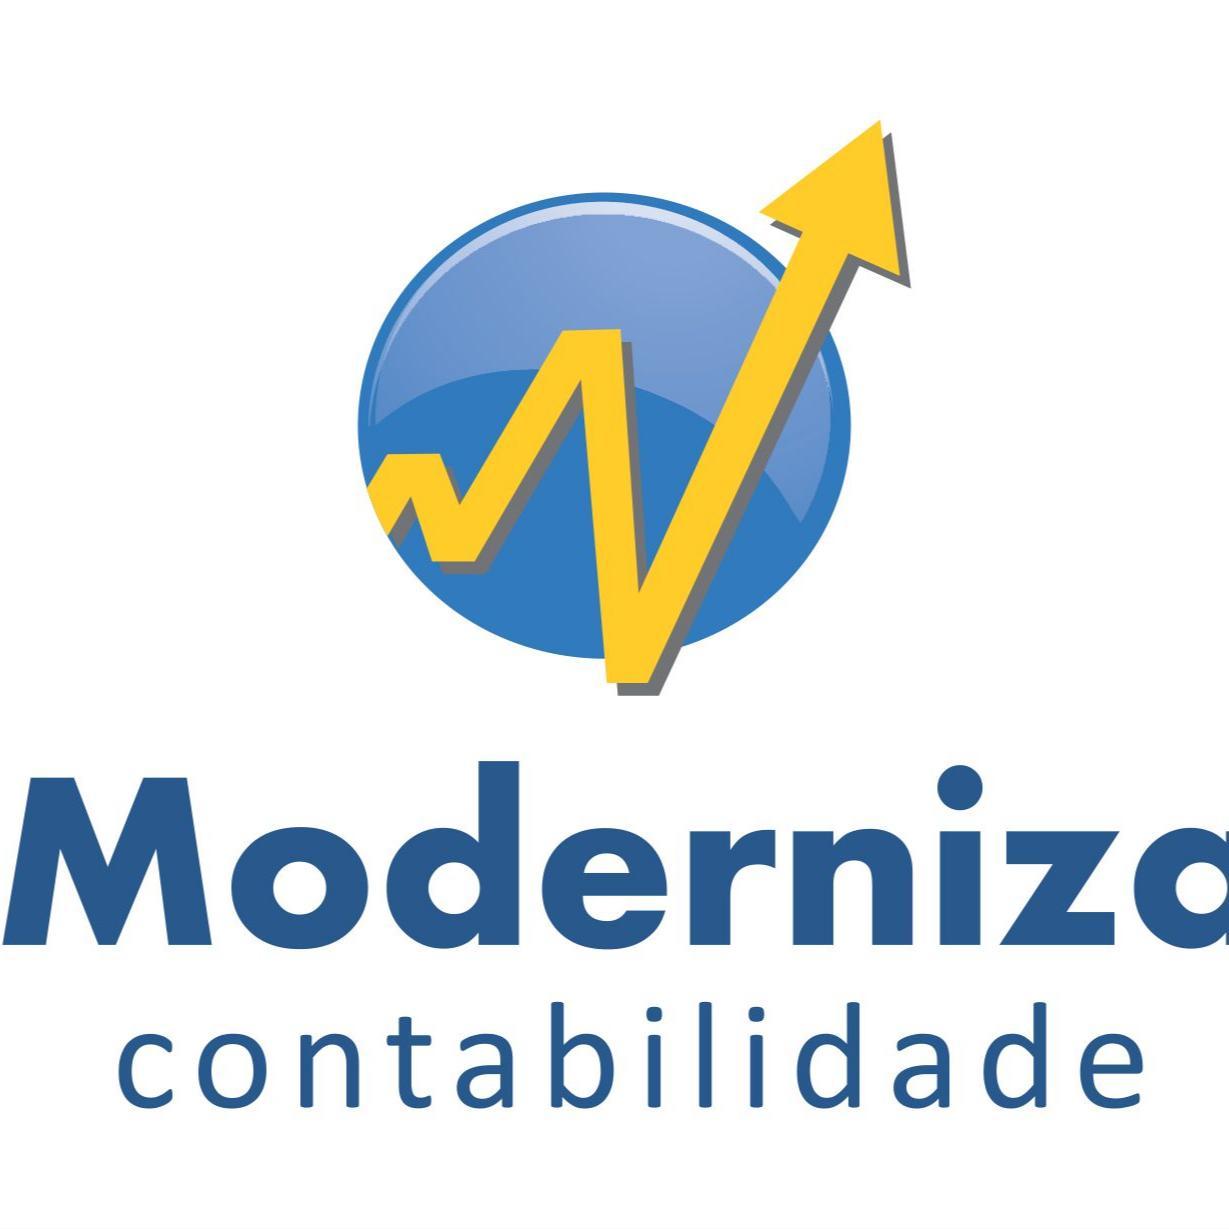 Moderniza Contabilidade